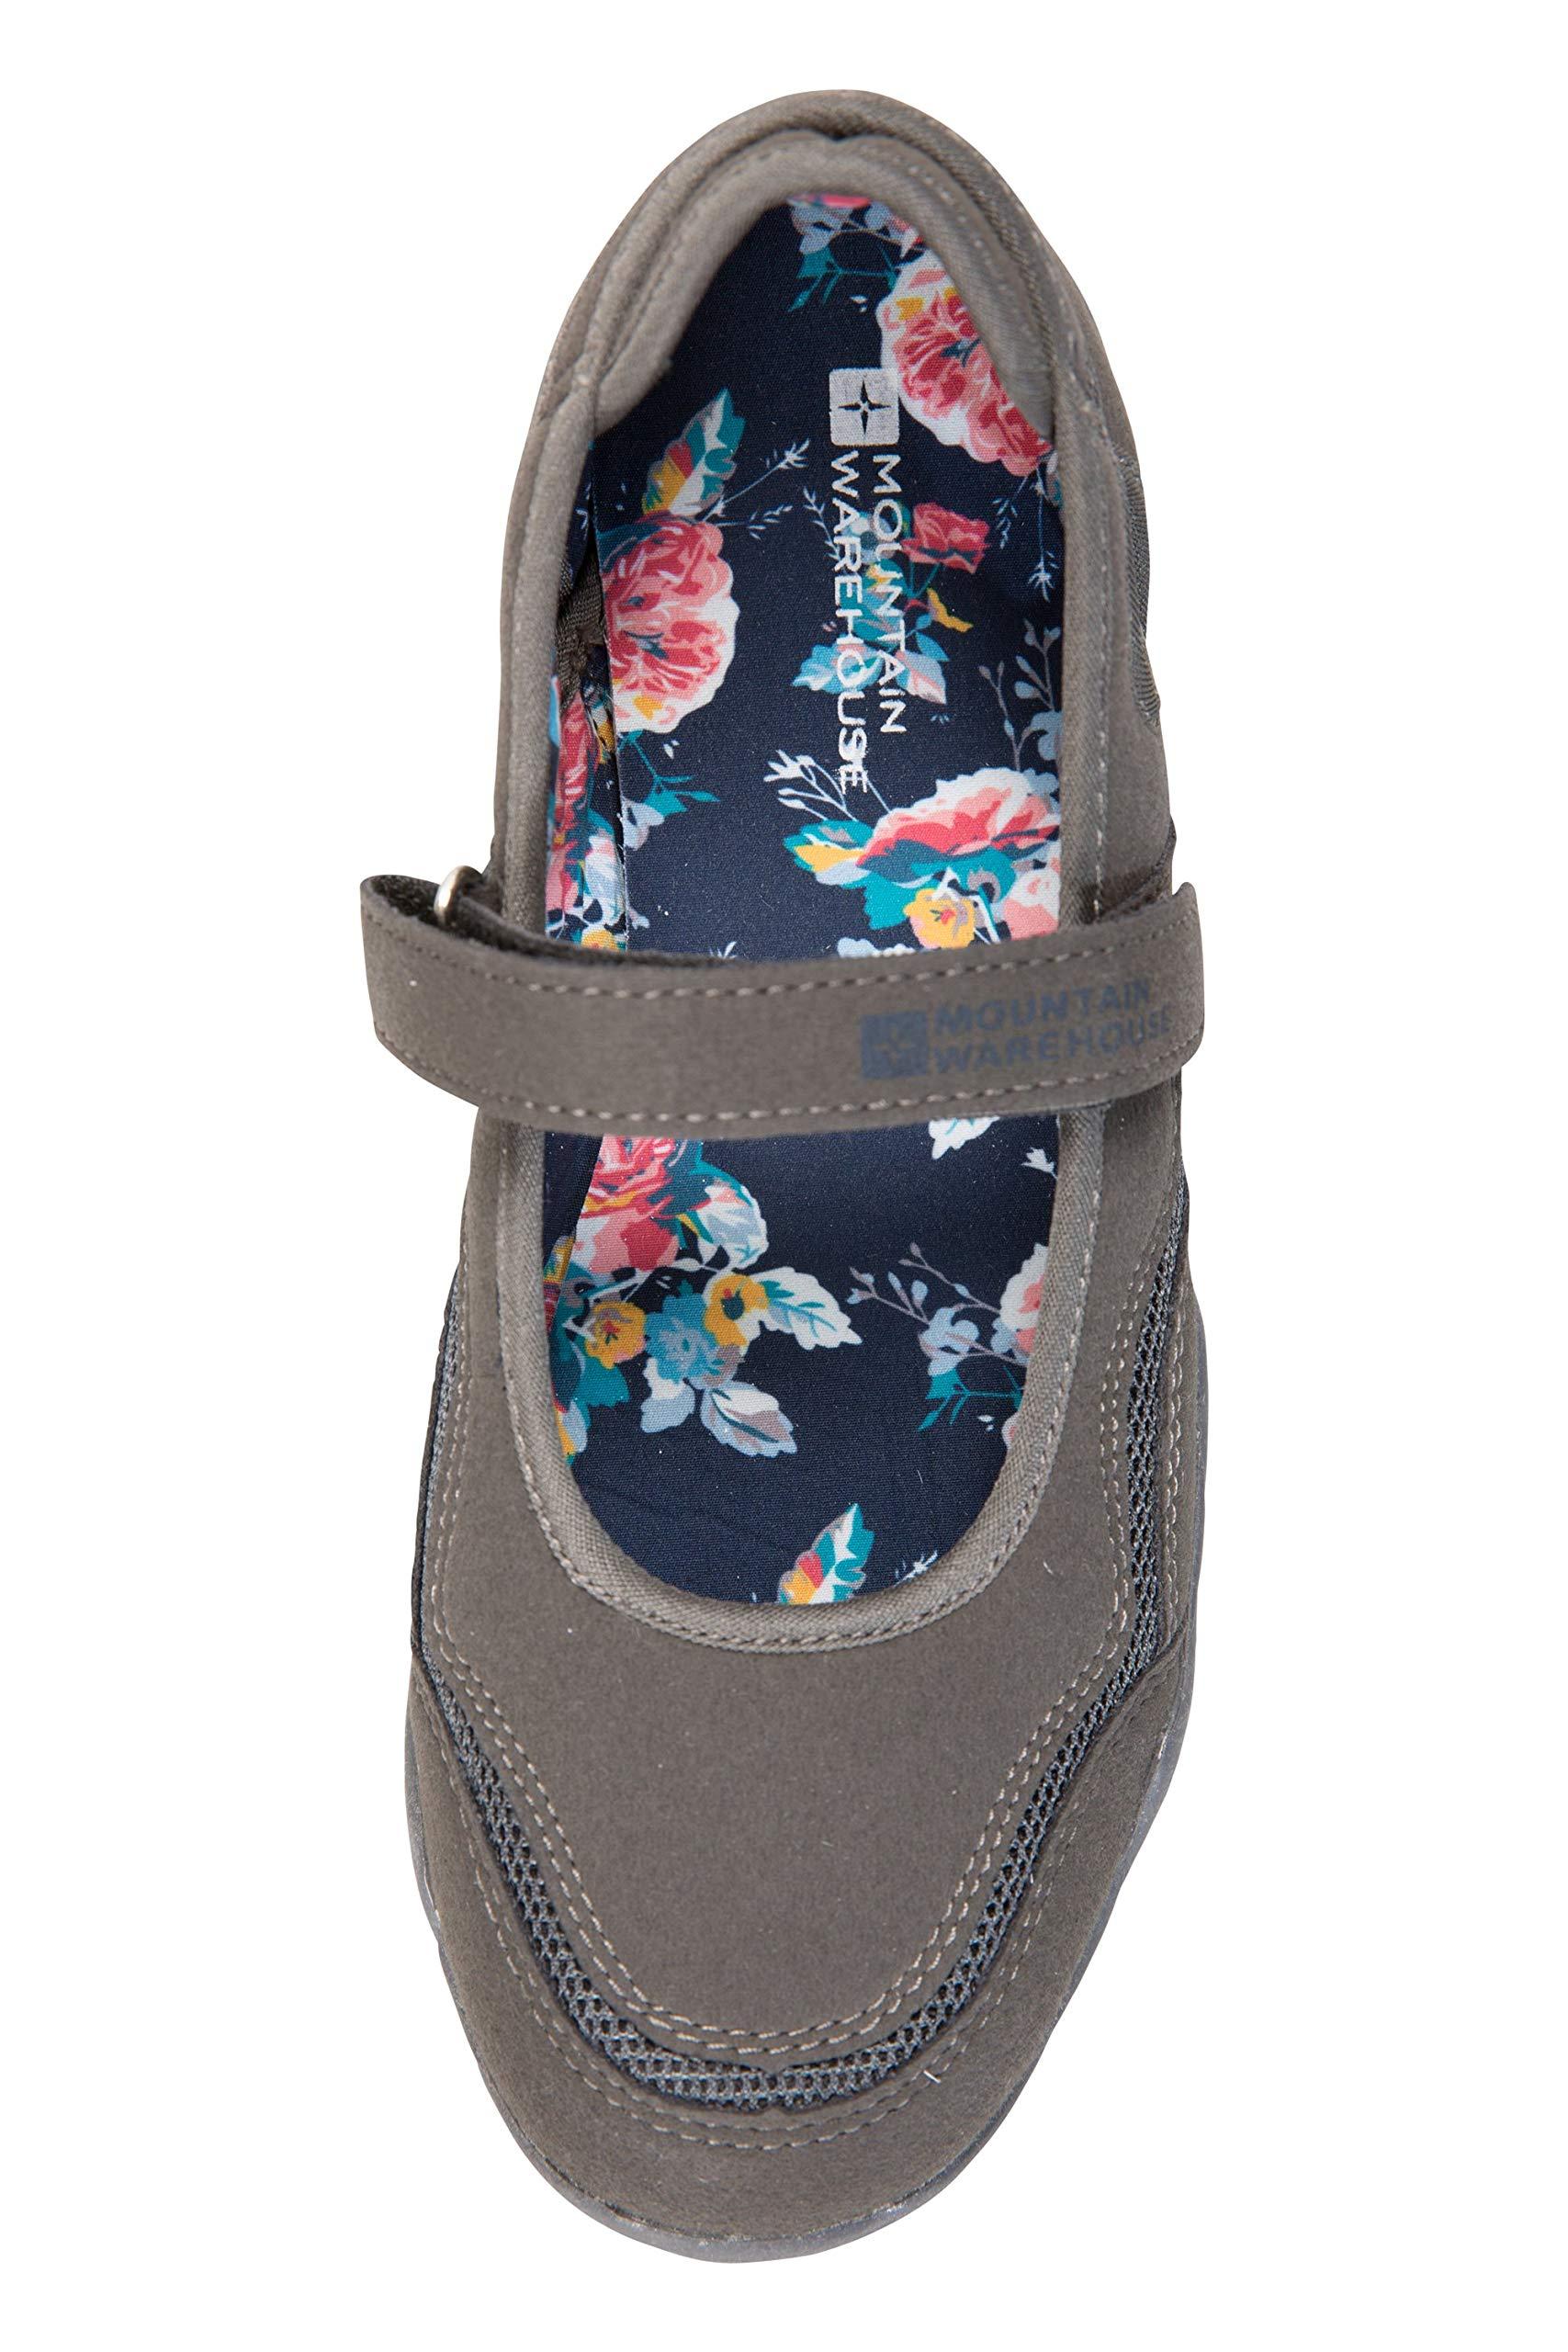 Mountain Warehouse Magda Womens Shoes